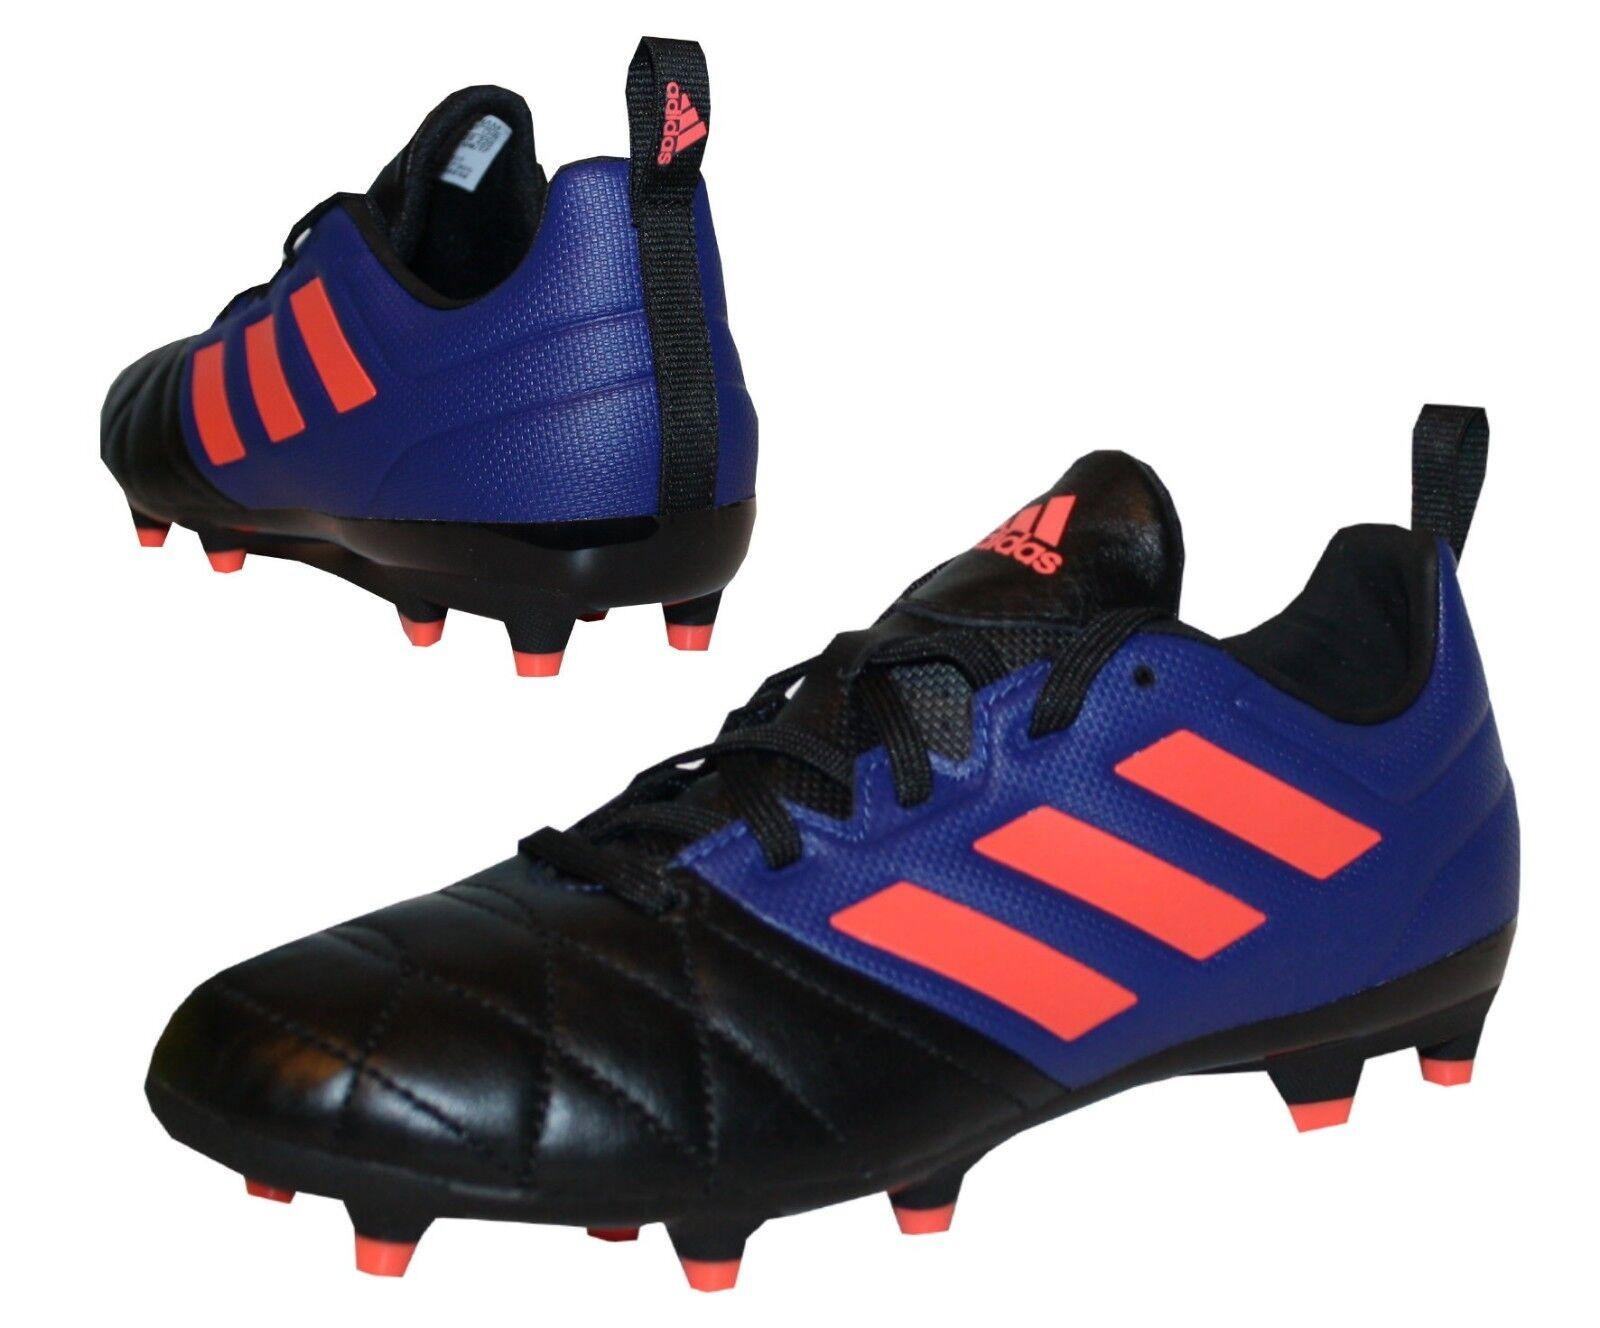 Adidas ACE 17.3 FG W Damen Mädchen Fußballschuhe Nocken Fußball Schuhe S77059